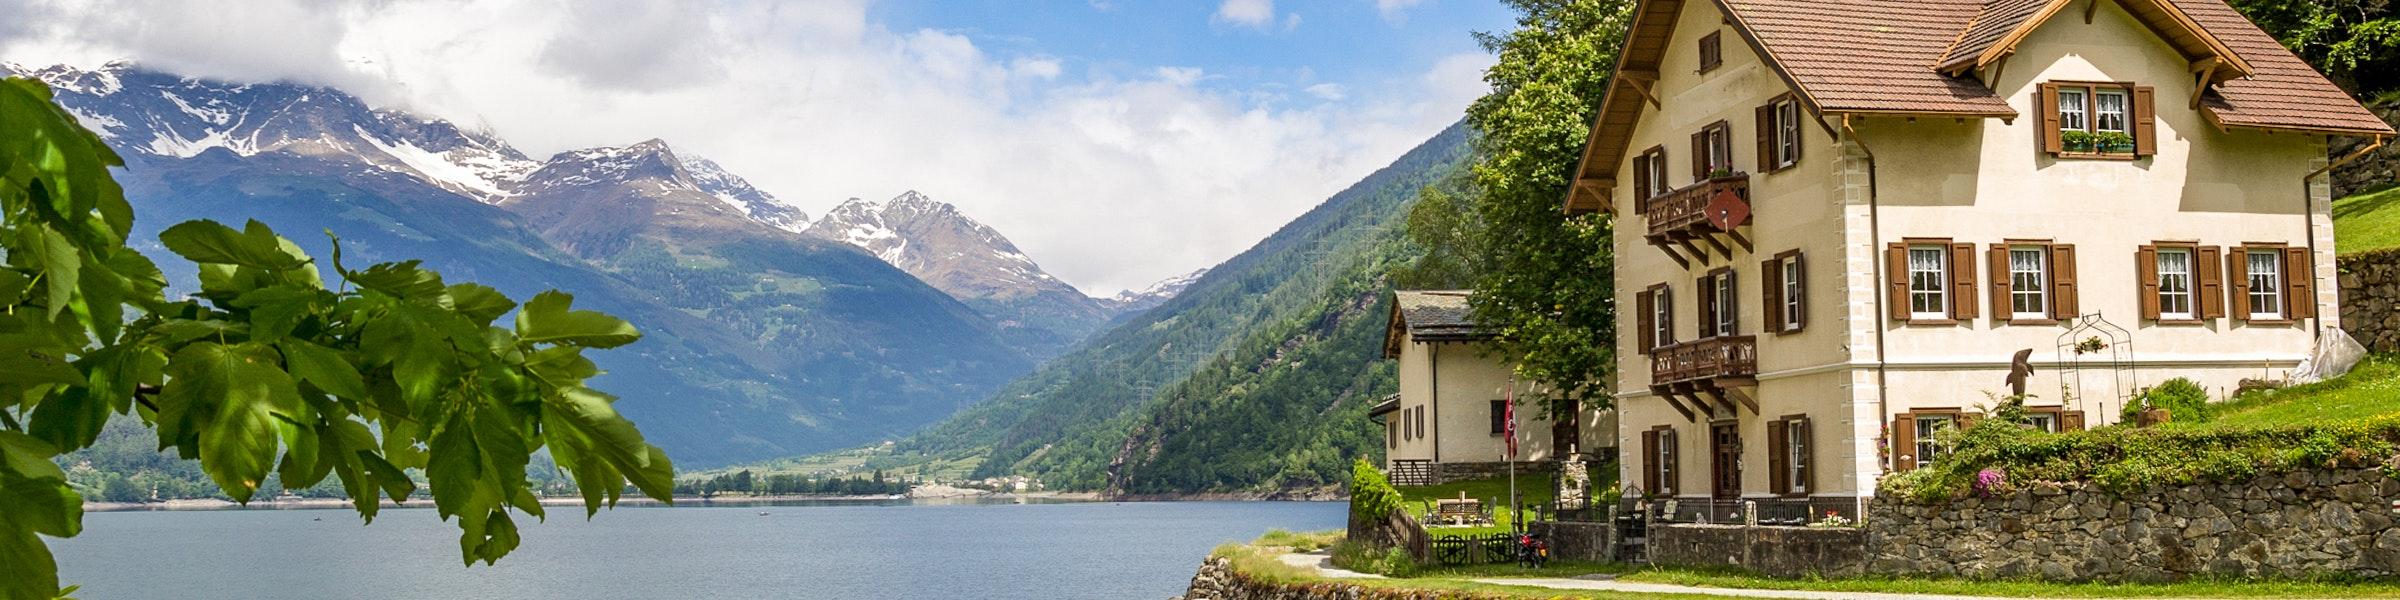 Lake Poschiavo